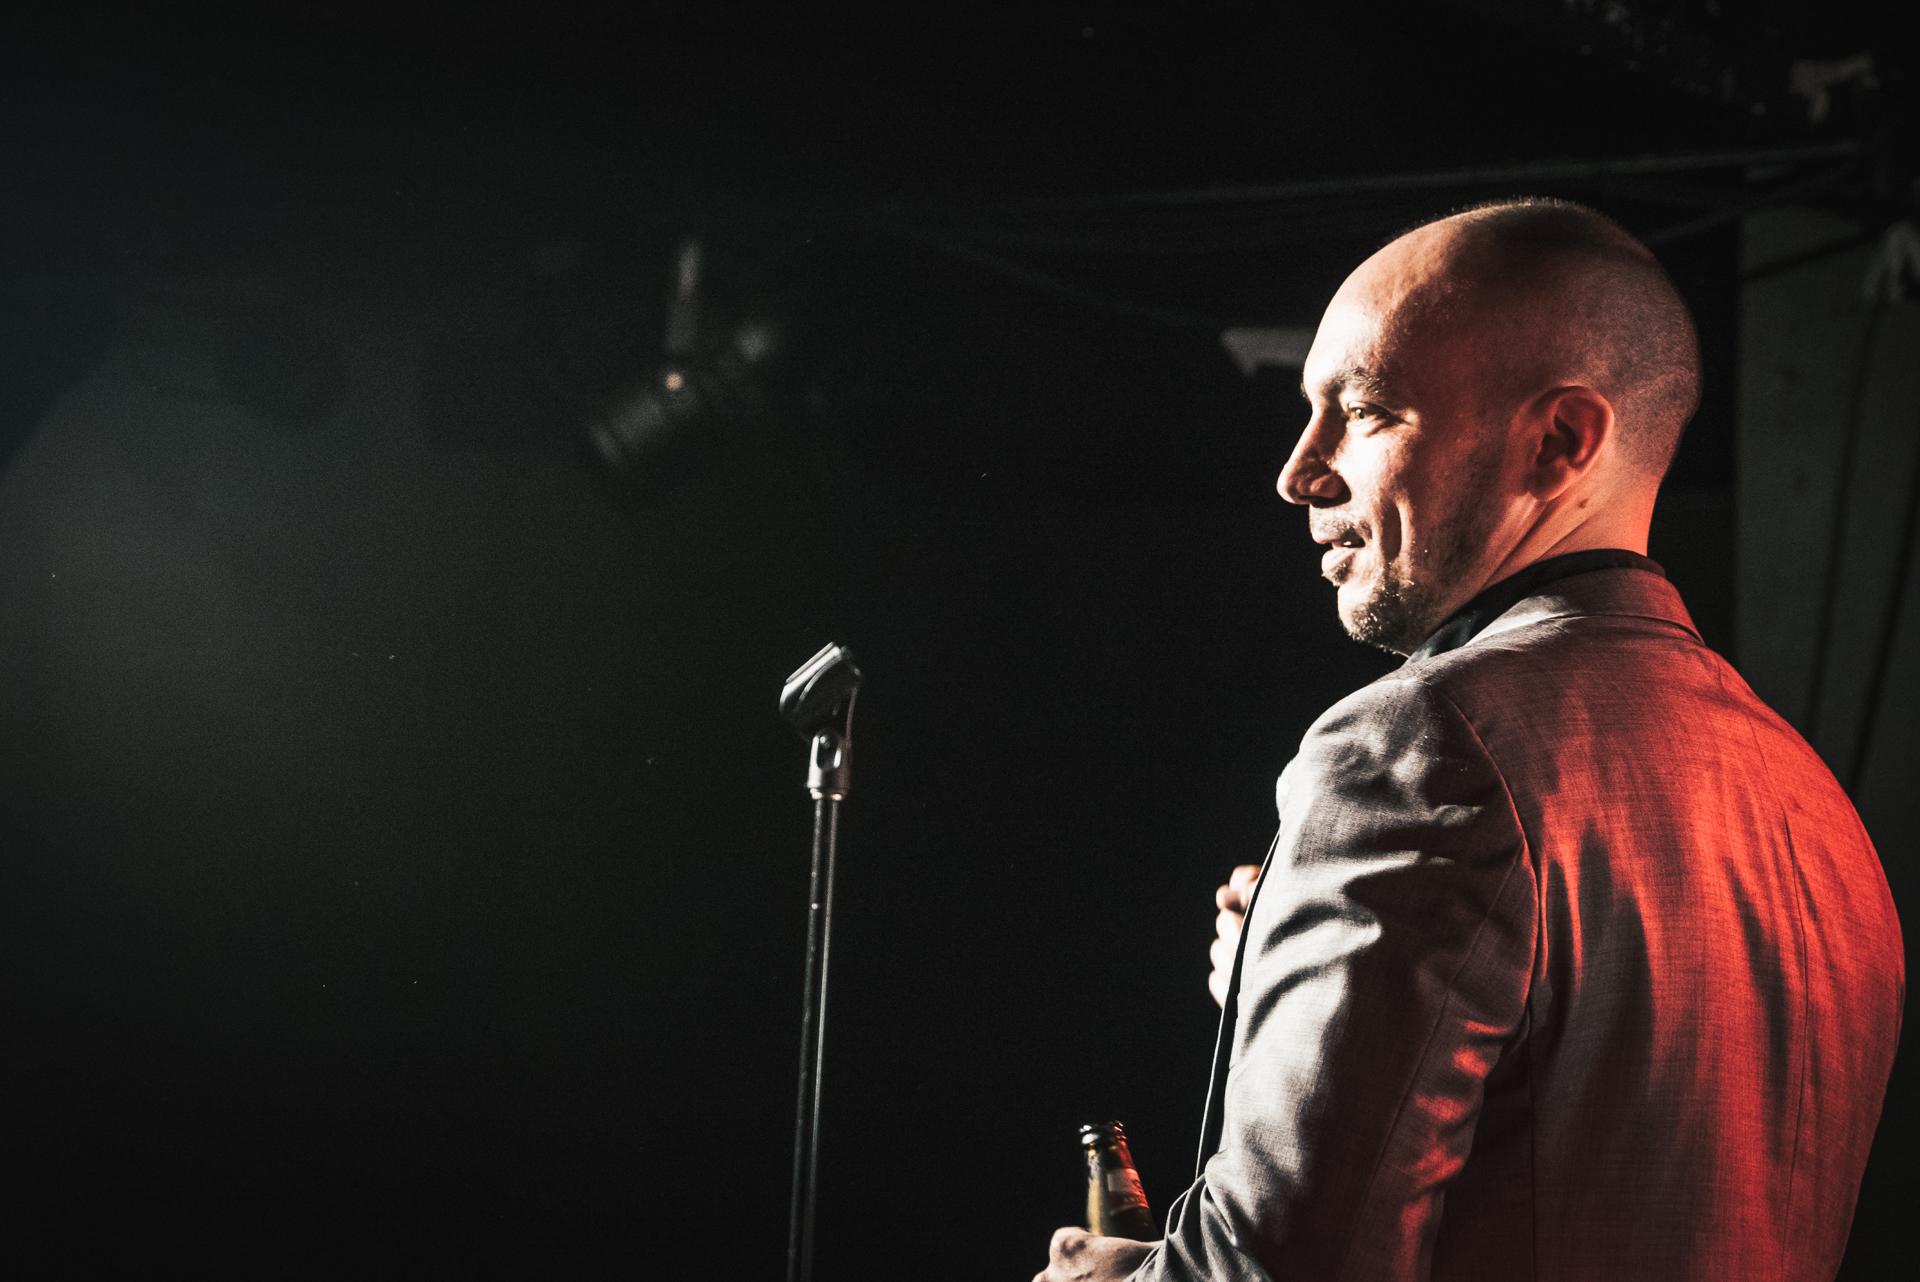 Daniel Zahler, May '17